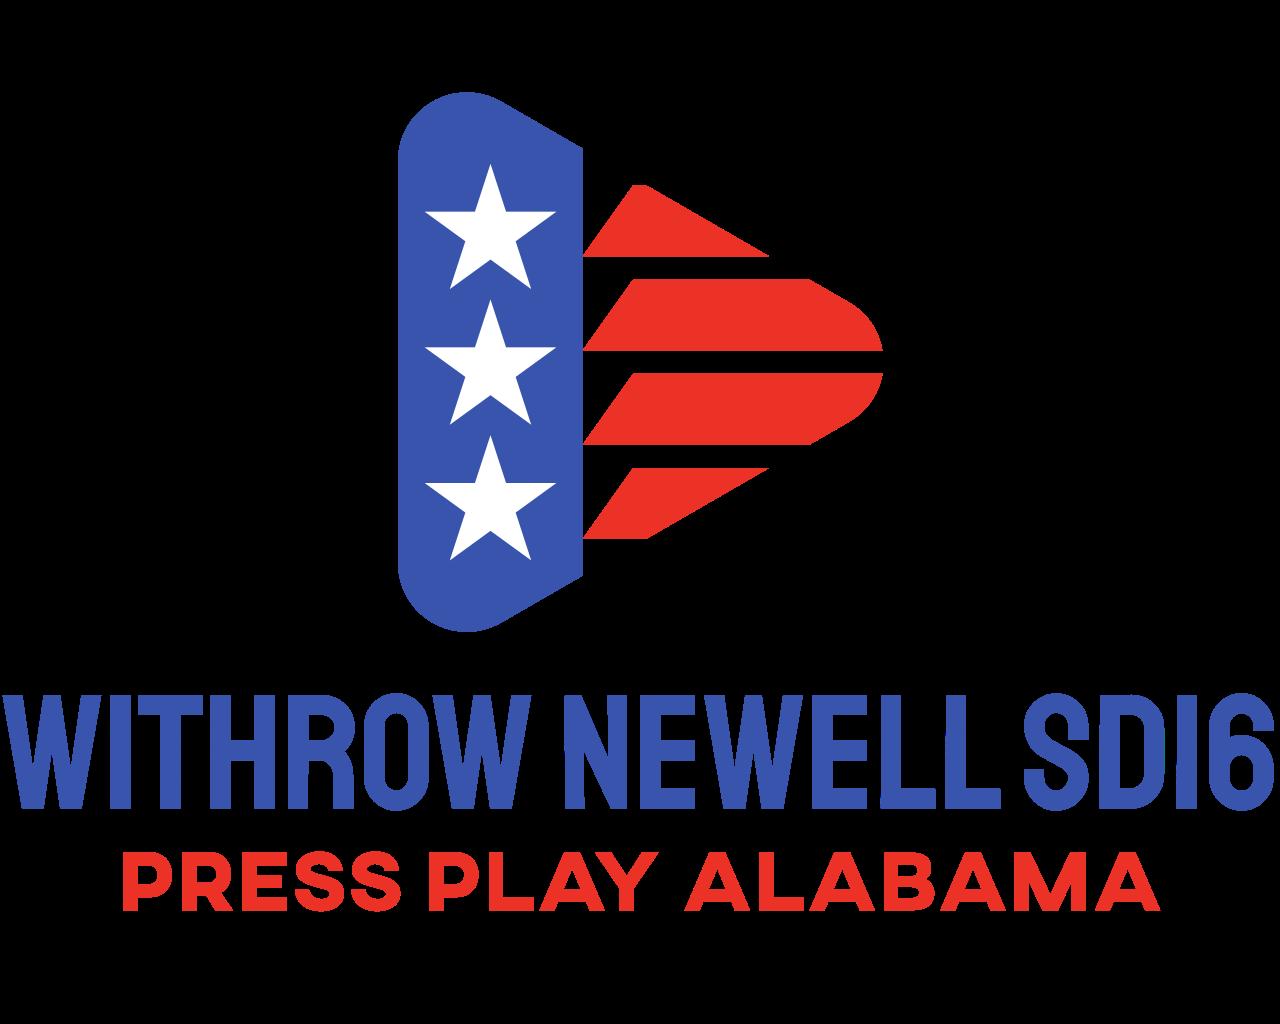 Withrow Newell SDI6